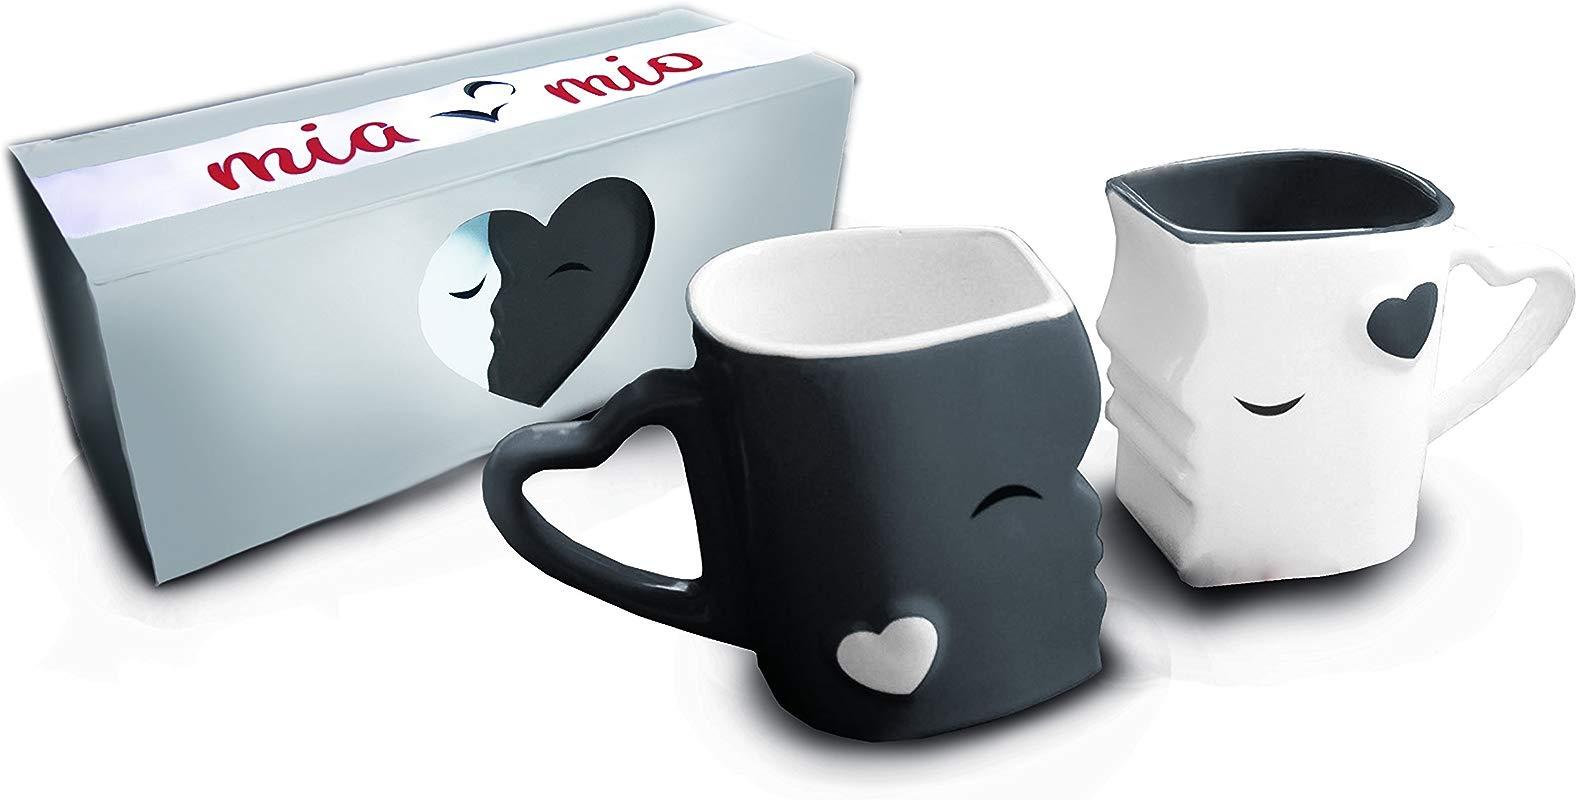 Mia Mio Coffee Mugs Kissing Mugs Bridal Pair Gift Set For Weddings Birthday Anniversary With Gift Box Gray